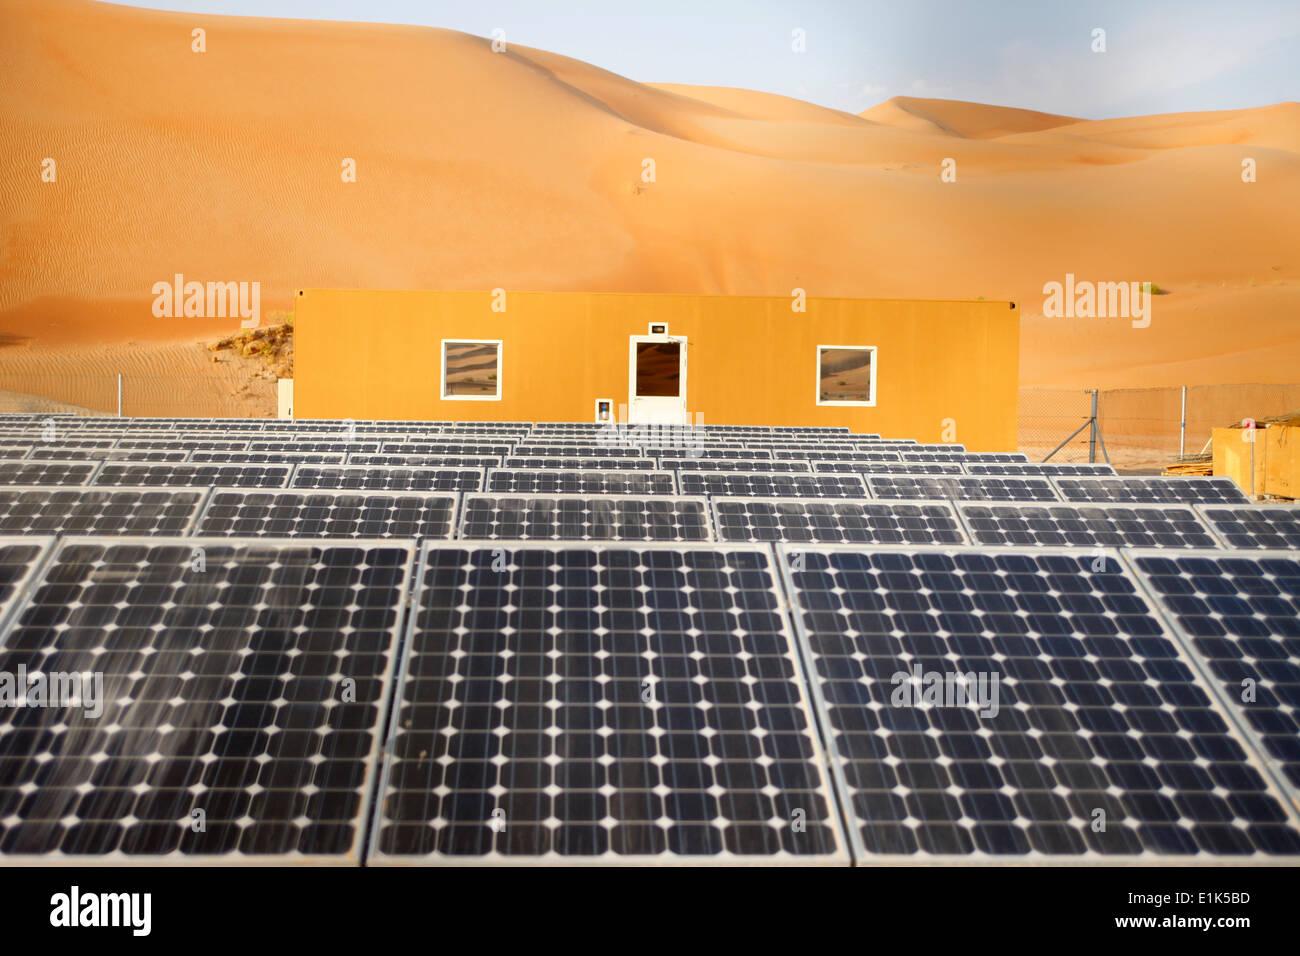 Solar panels in Liwa desert - Stock Image